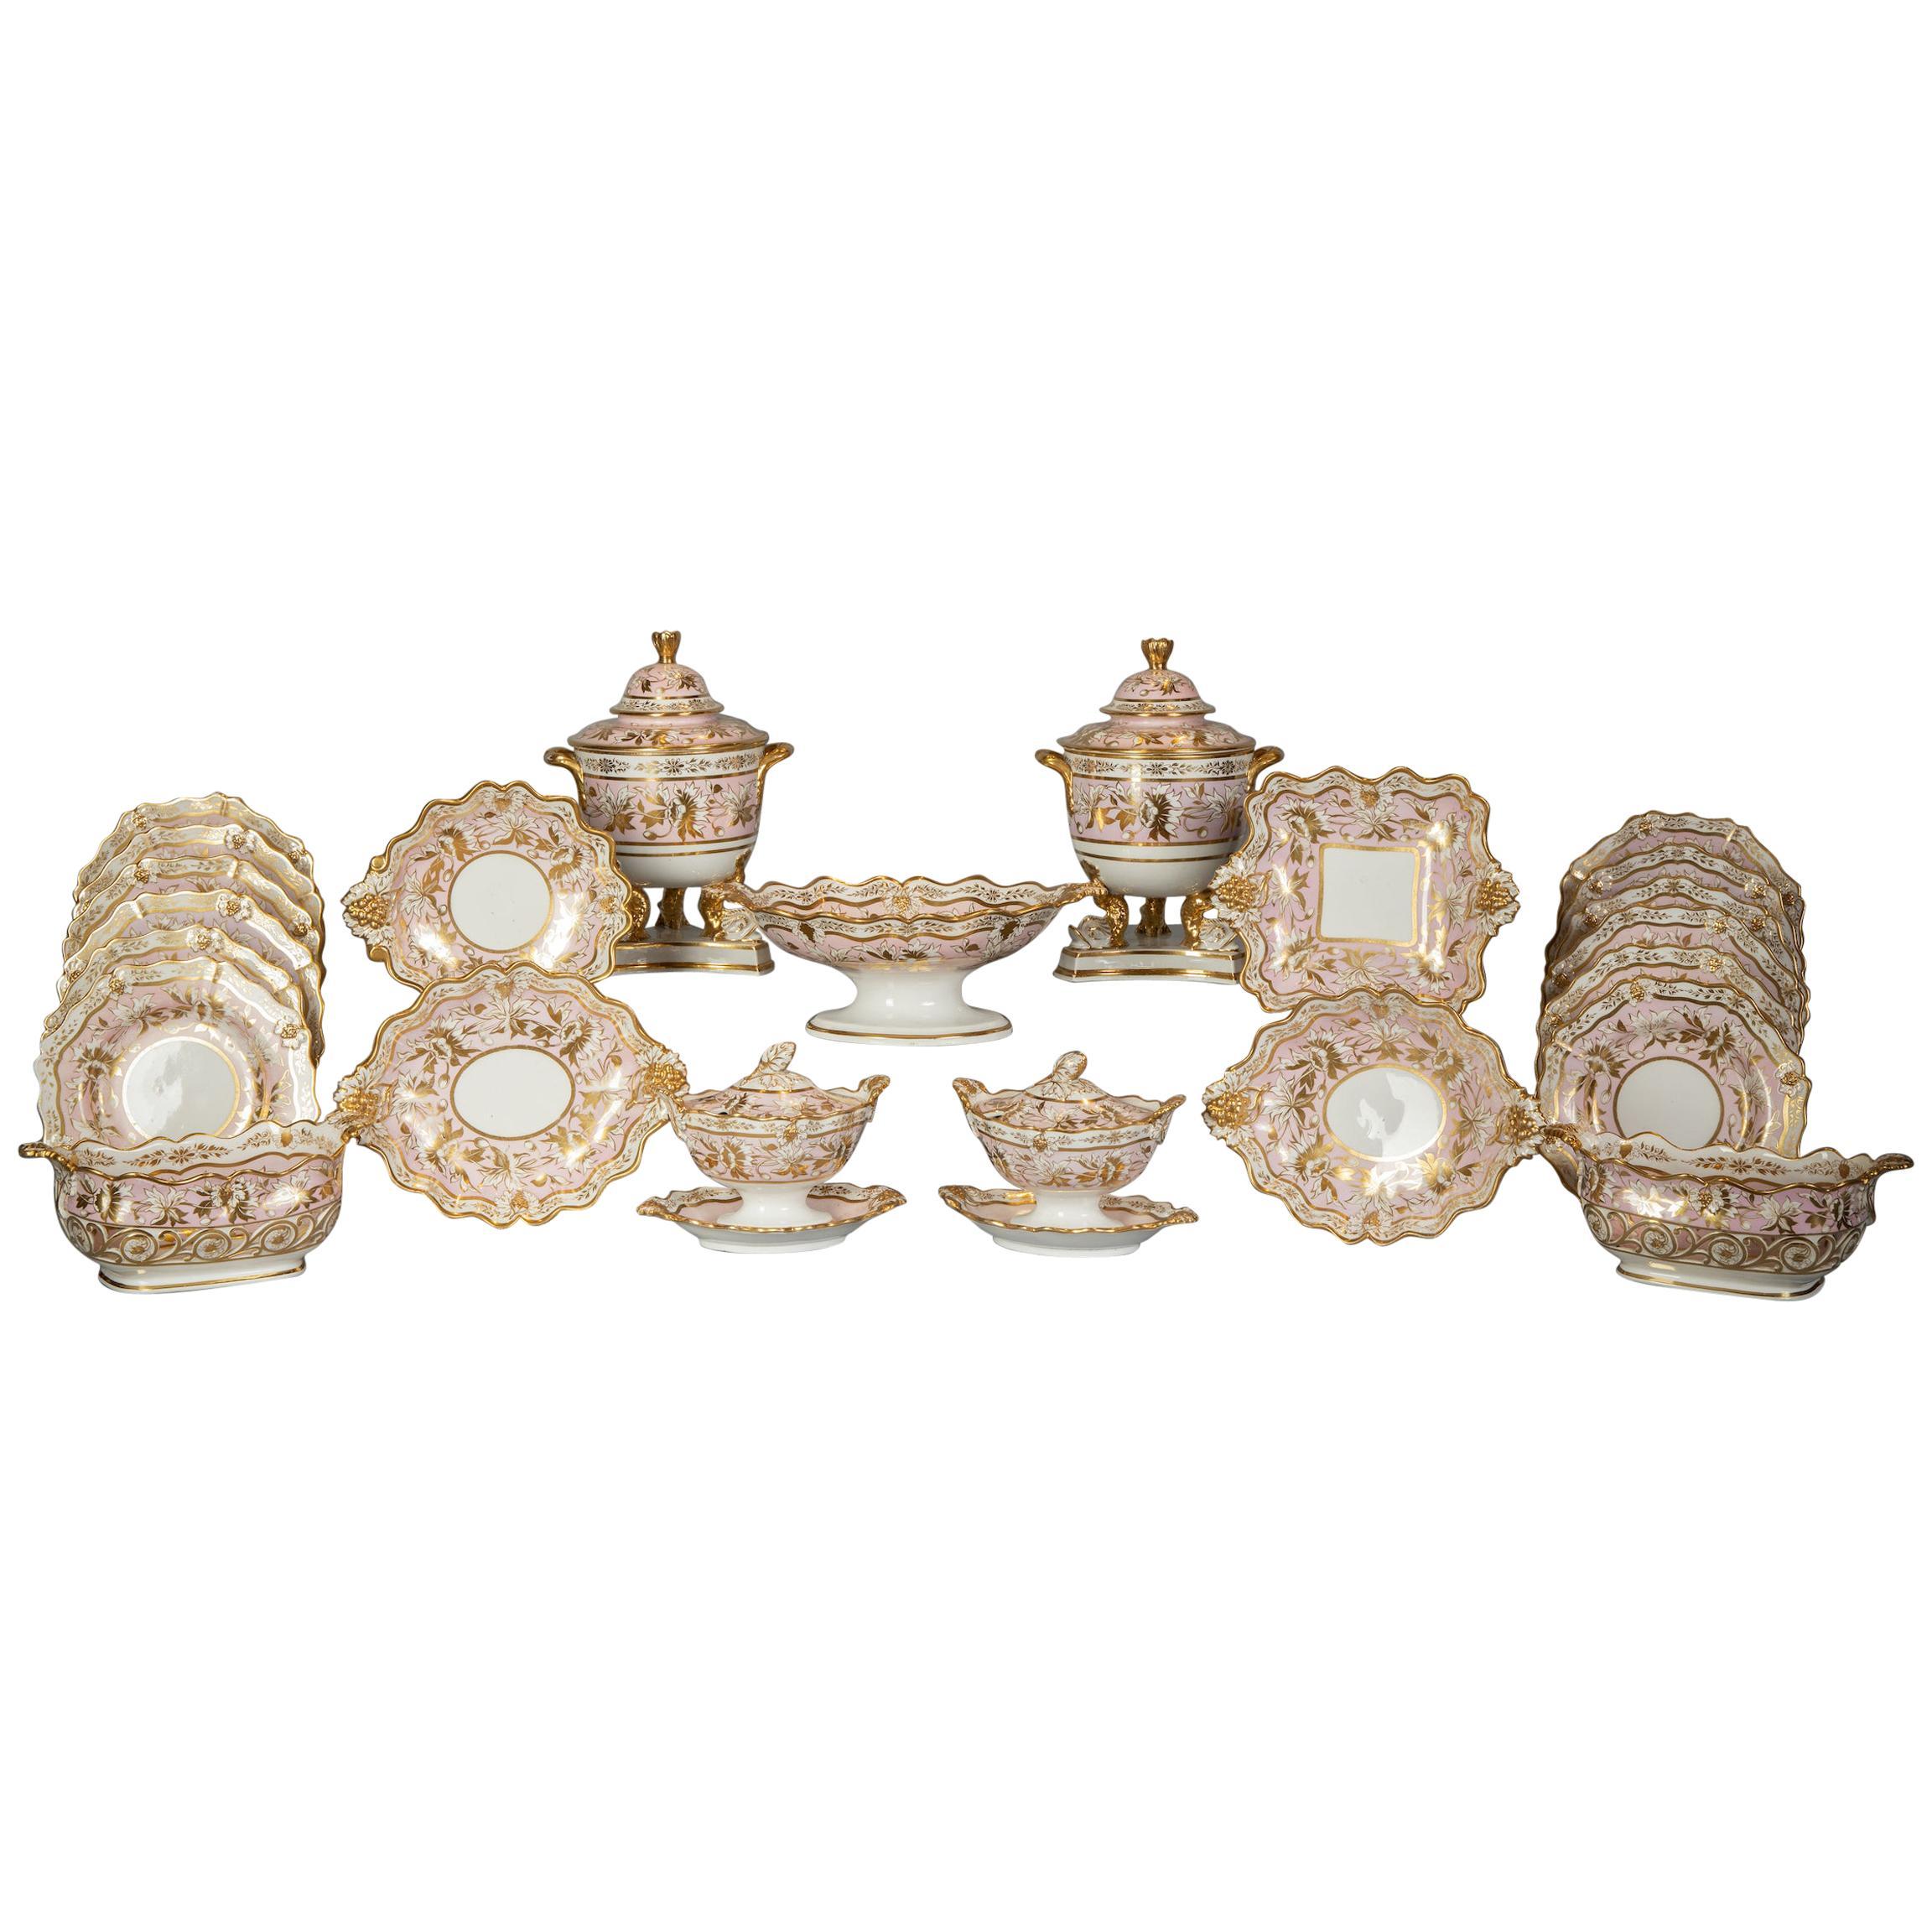 Extensive English Porcelain Dessert Service, circa 1825